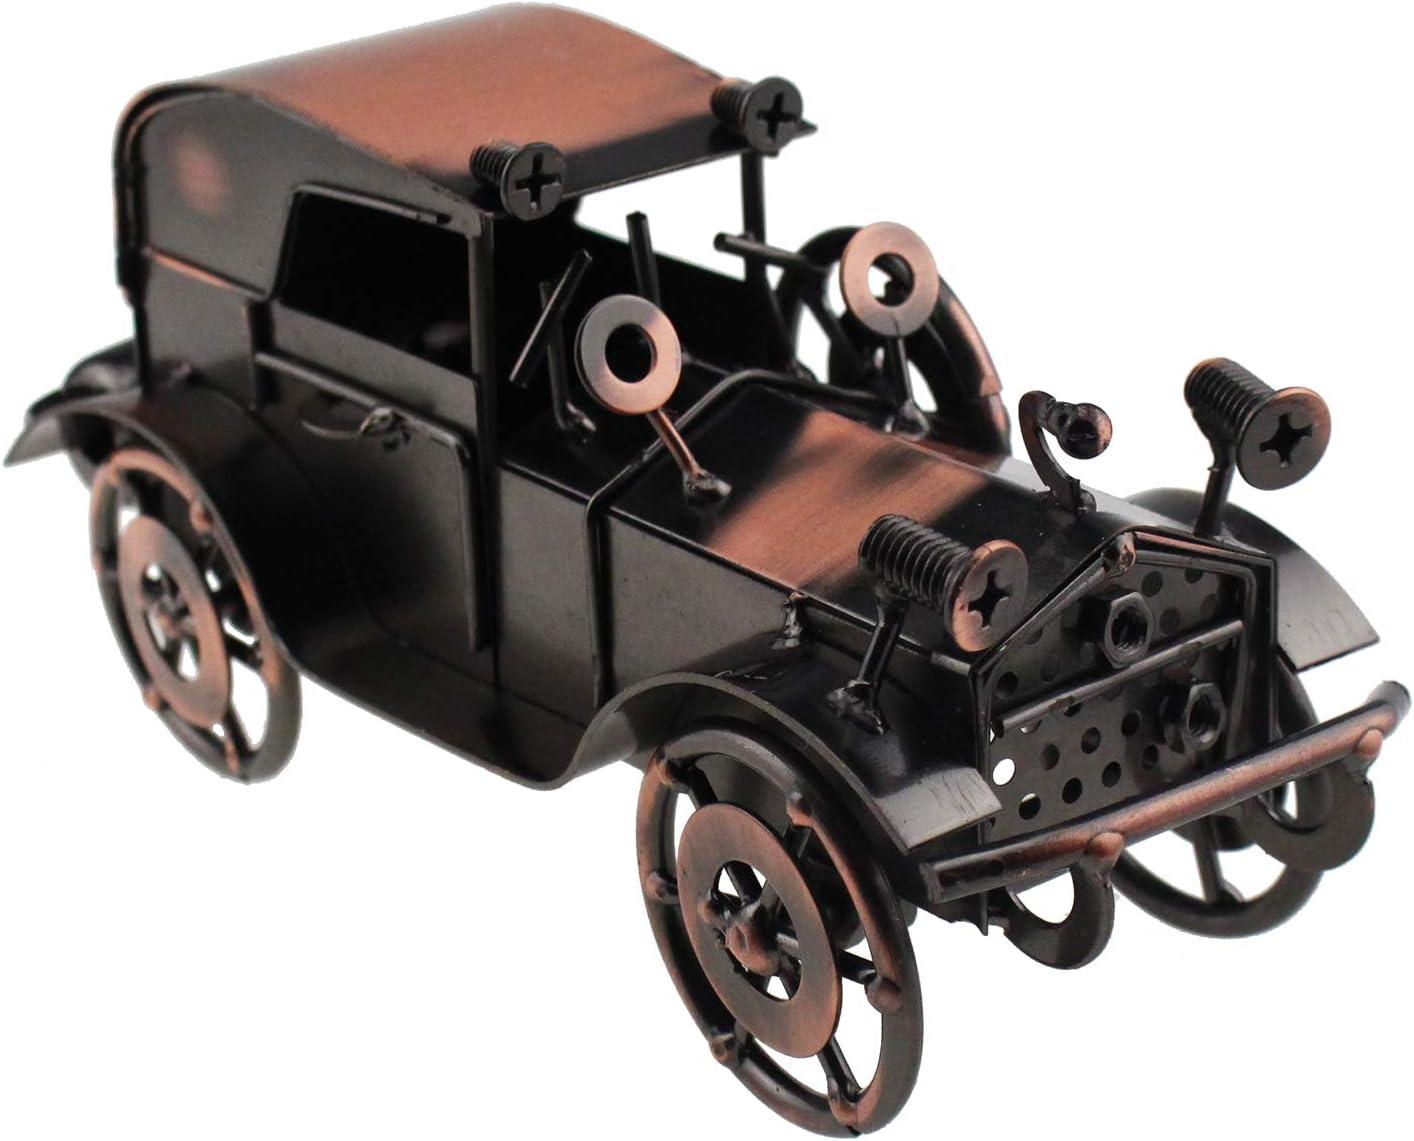 Tipmant Antique Vintage Car Tin Metal Truck Home Décor Accents Decoration Ornaments Collections Collectible Vehicle Model